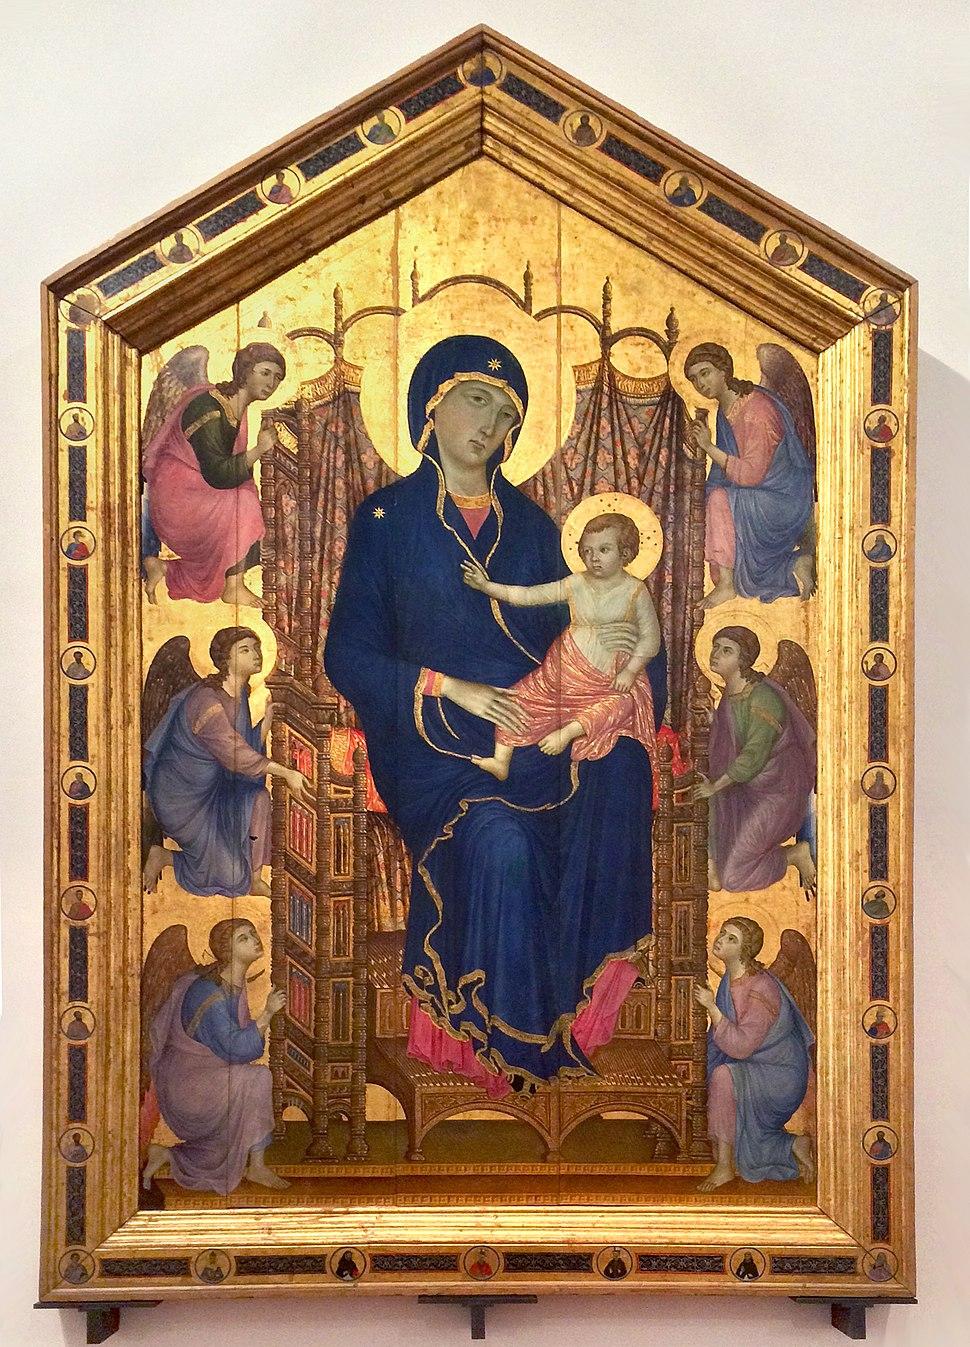 Madonna em Majestade dita Rucellai - Duccio